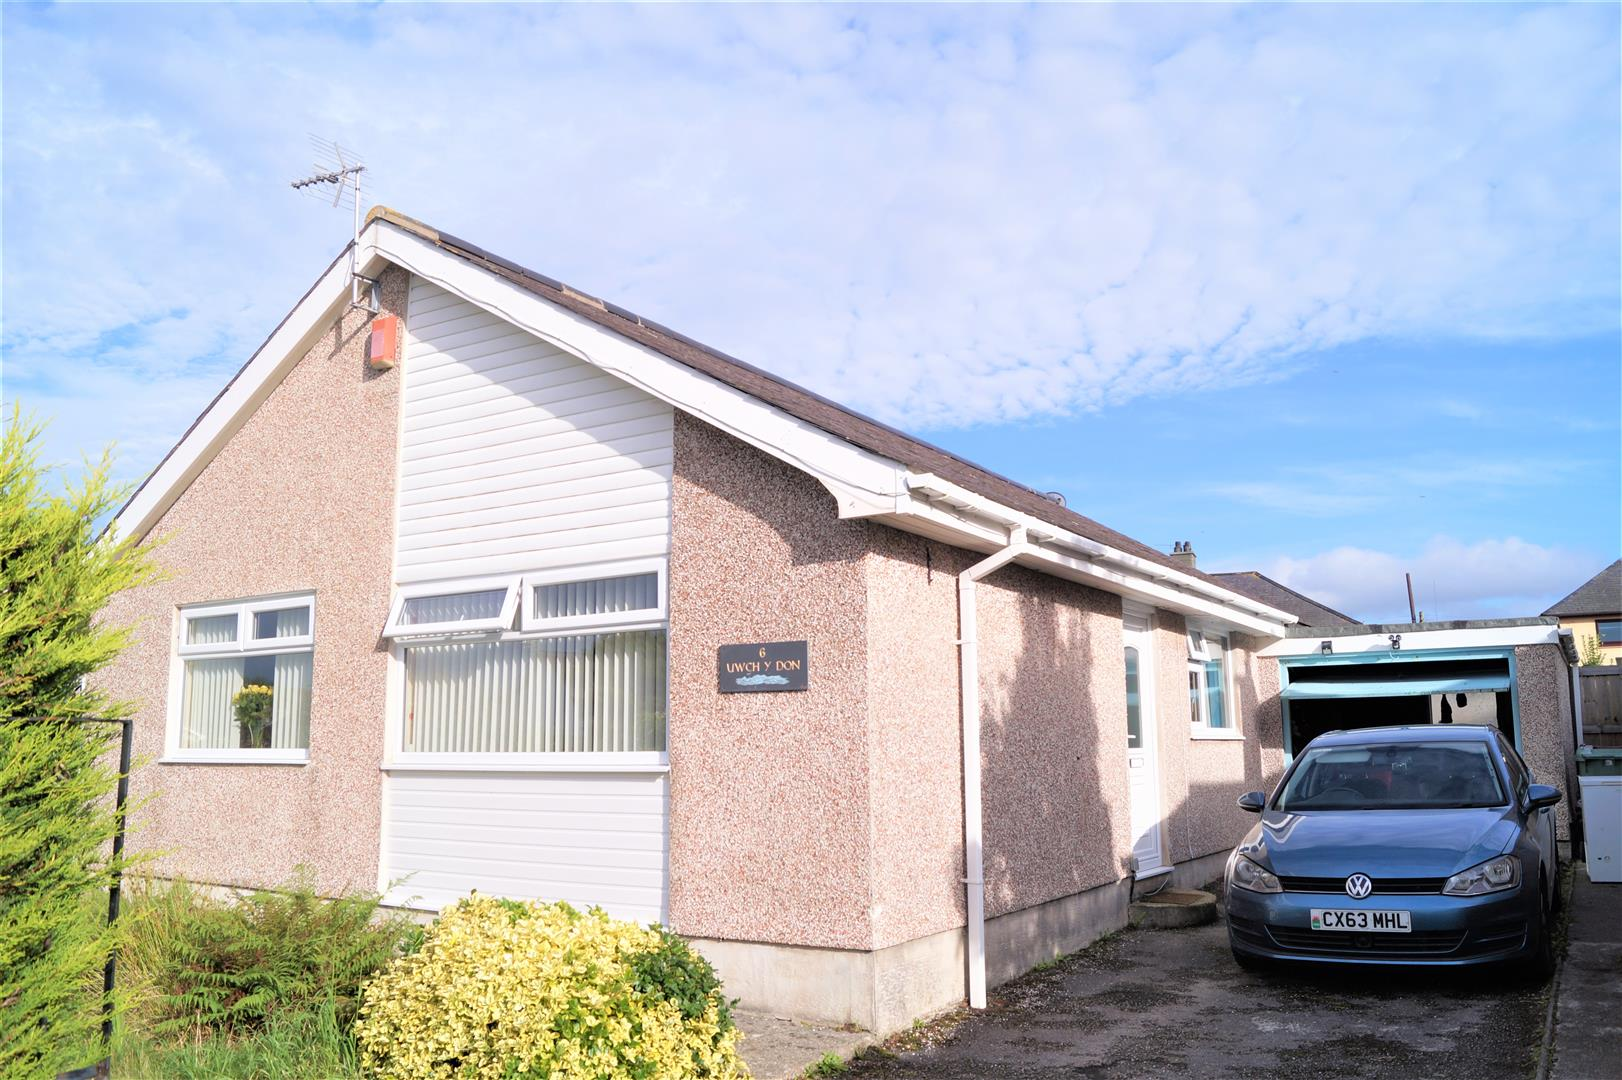 Garth Estate, Pontllyfni, Caernarfon